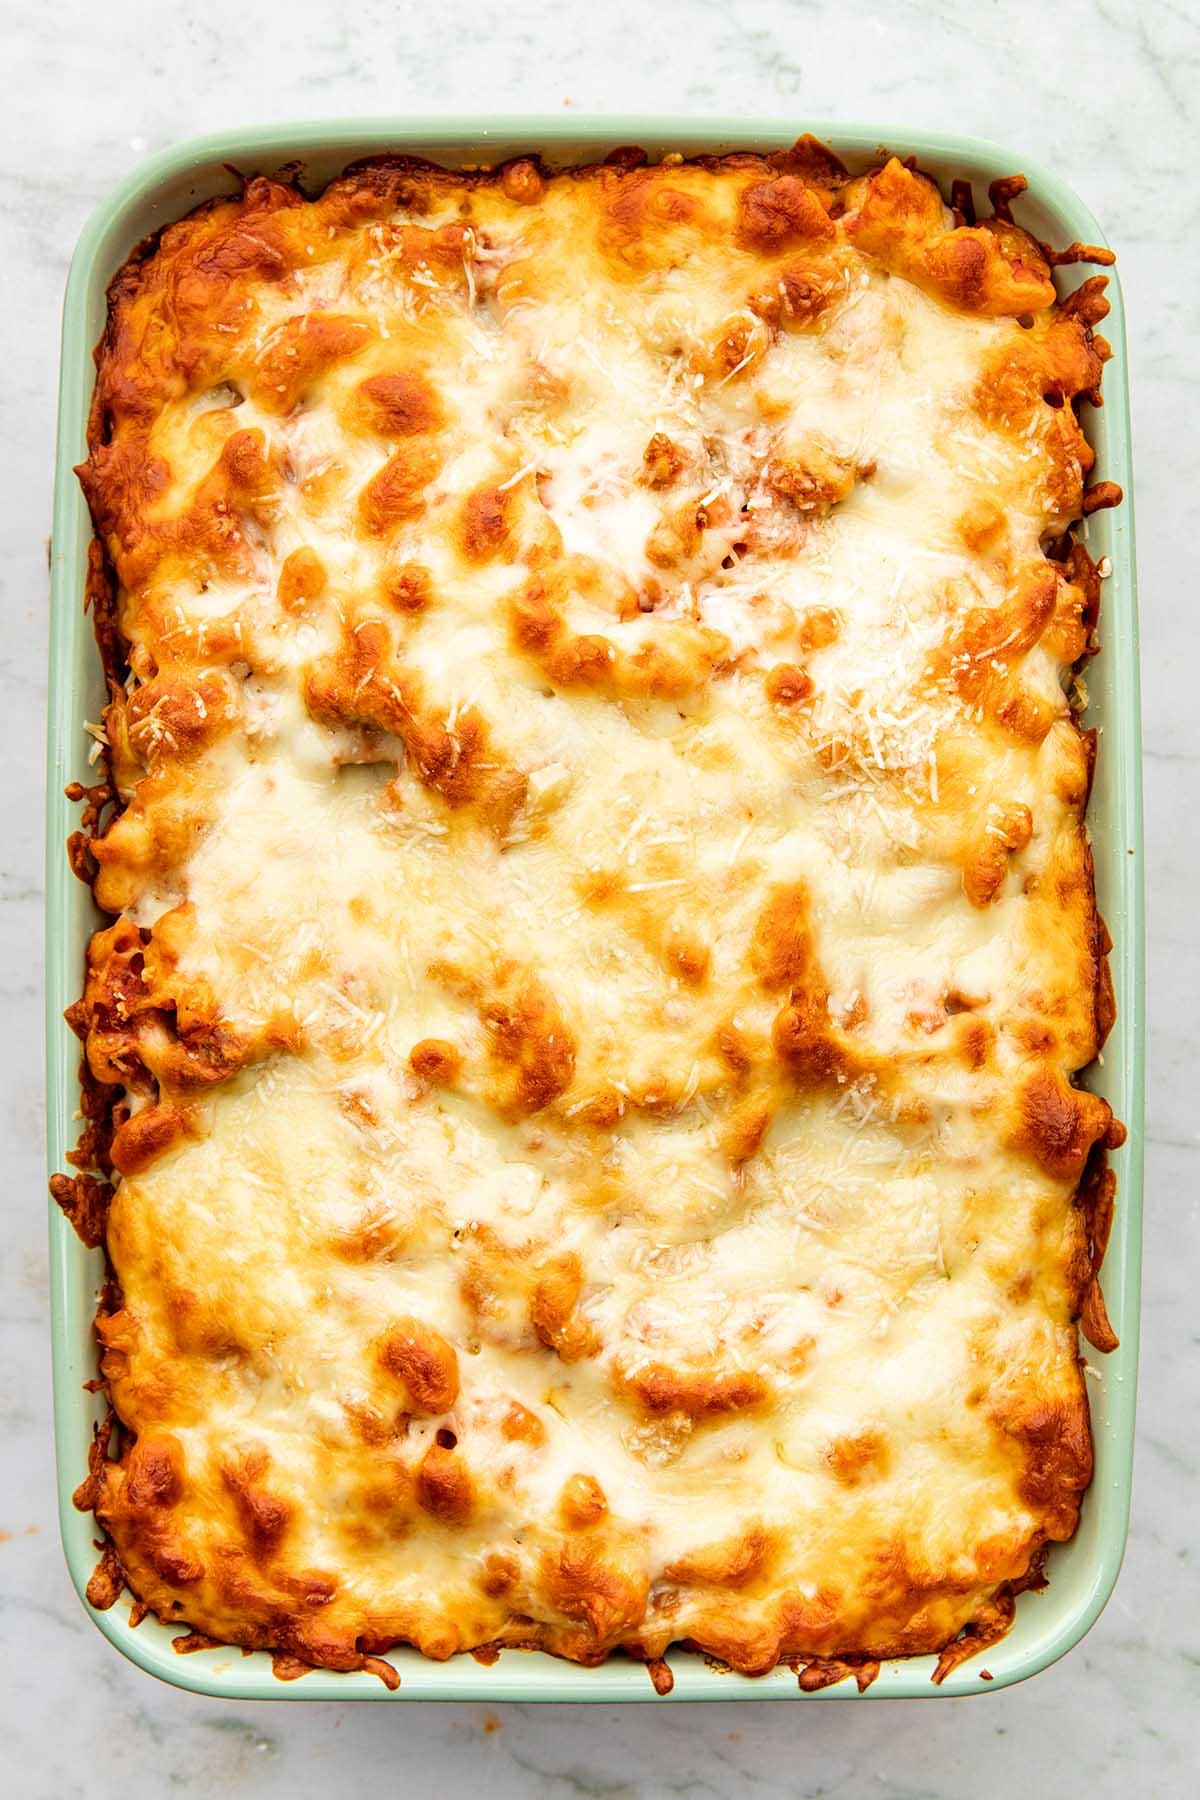 Close up overhead of a baking dish of Italian sausage casserole.